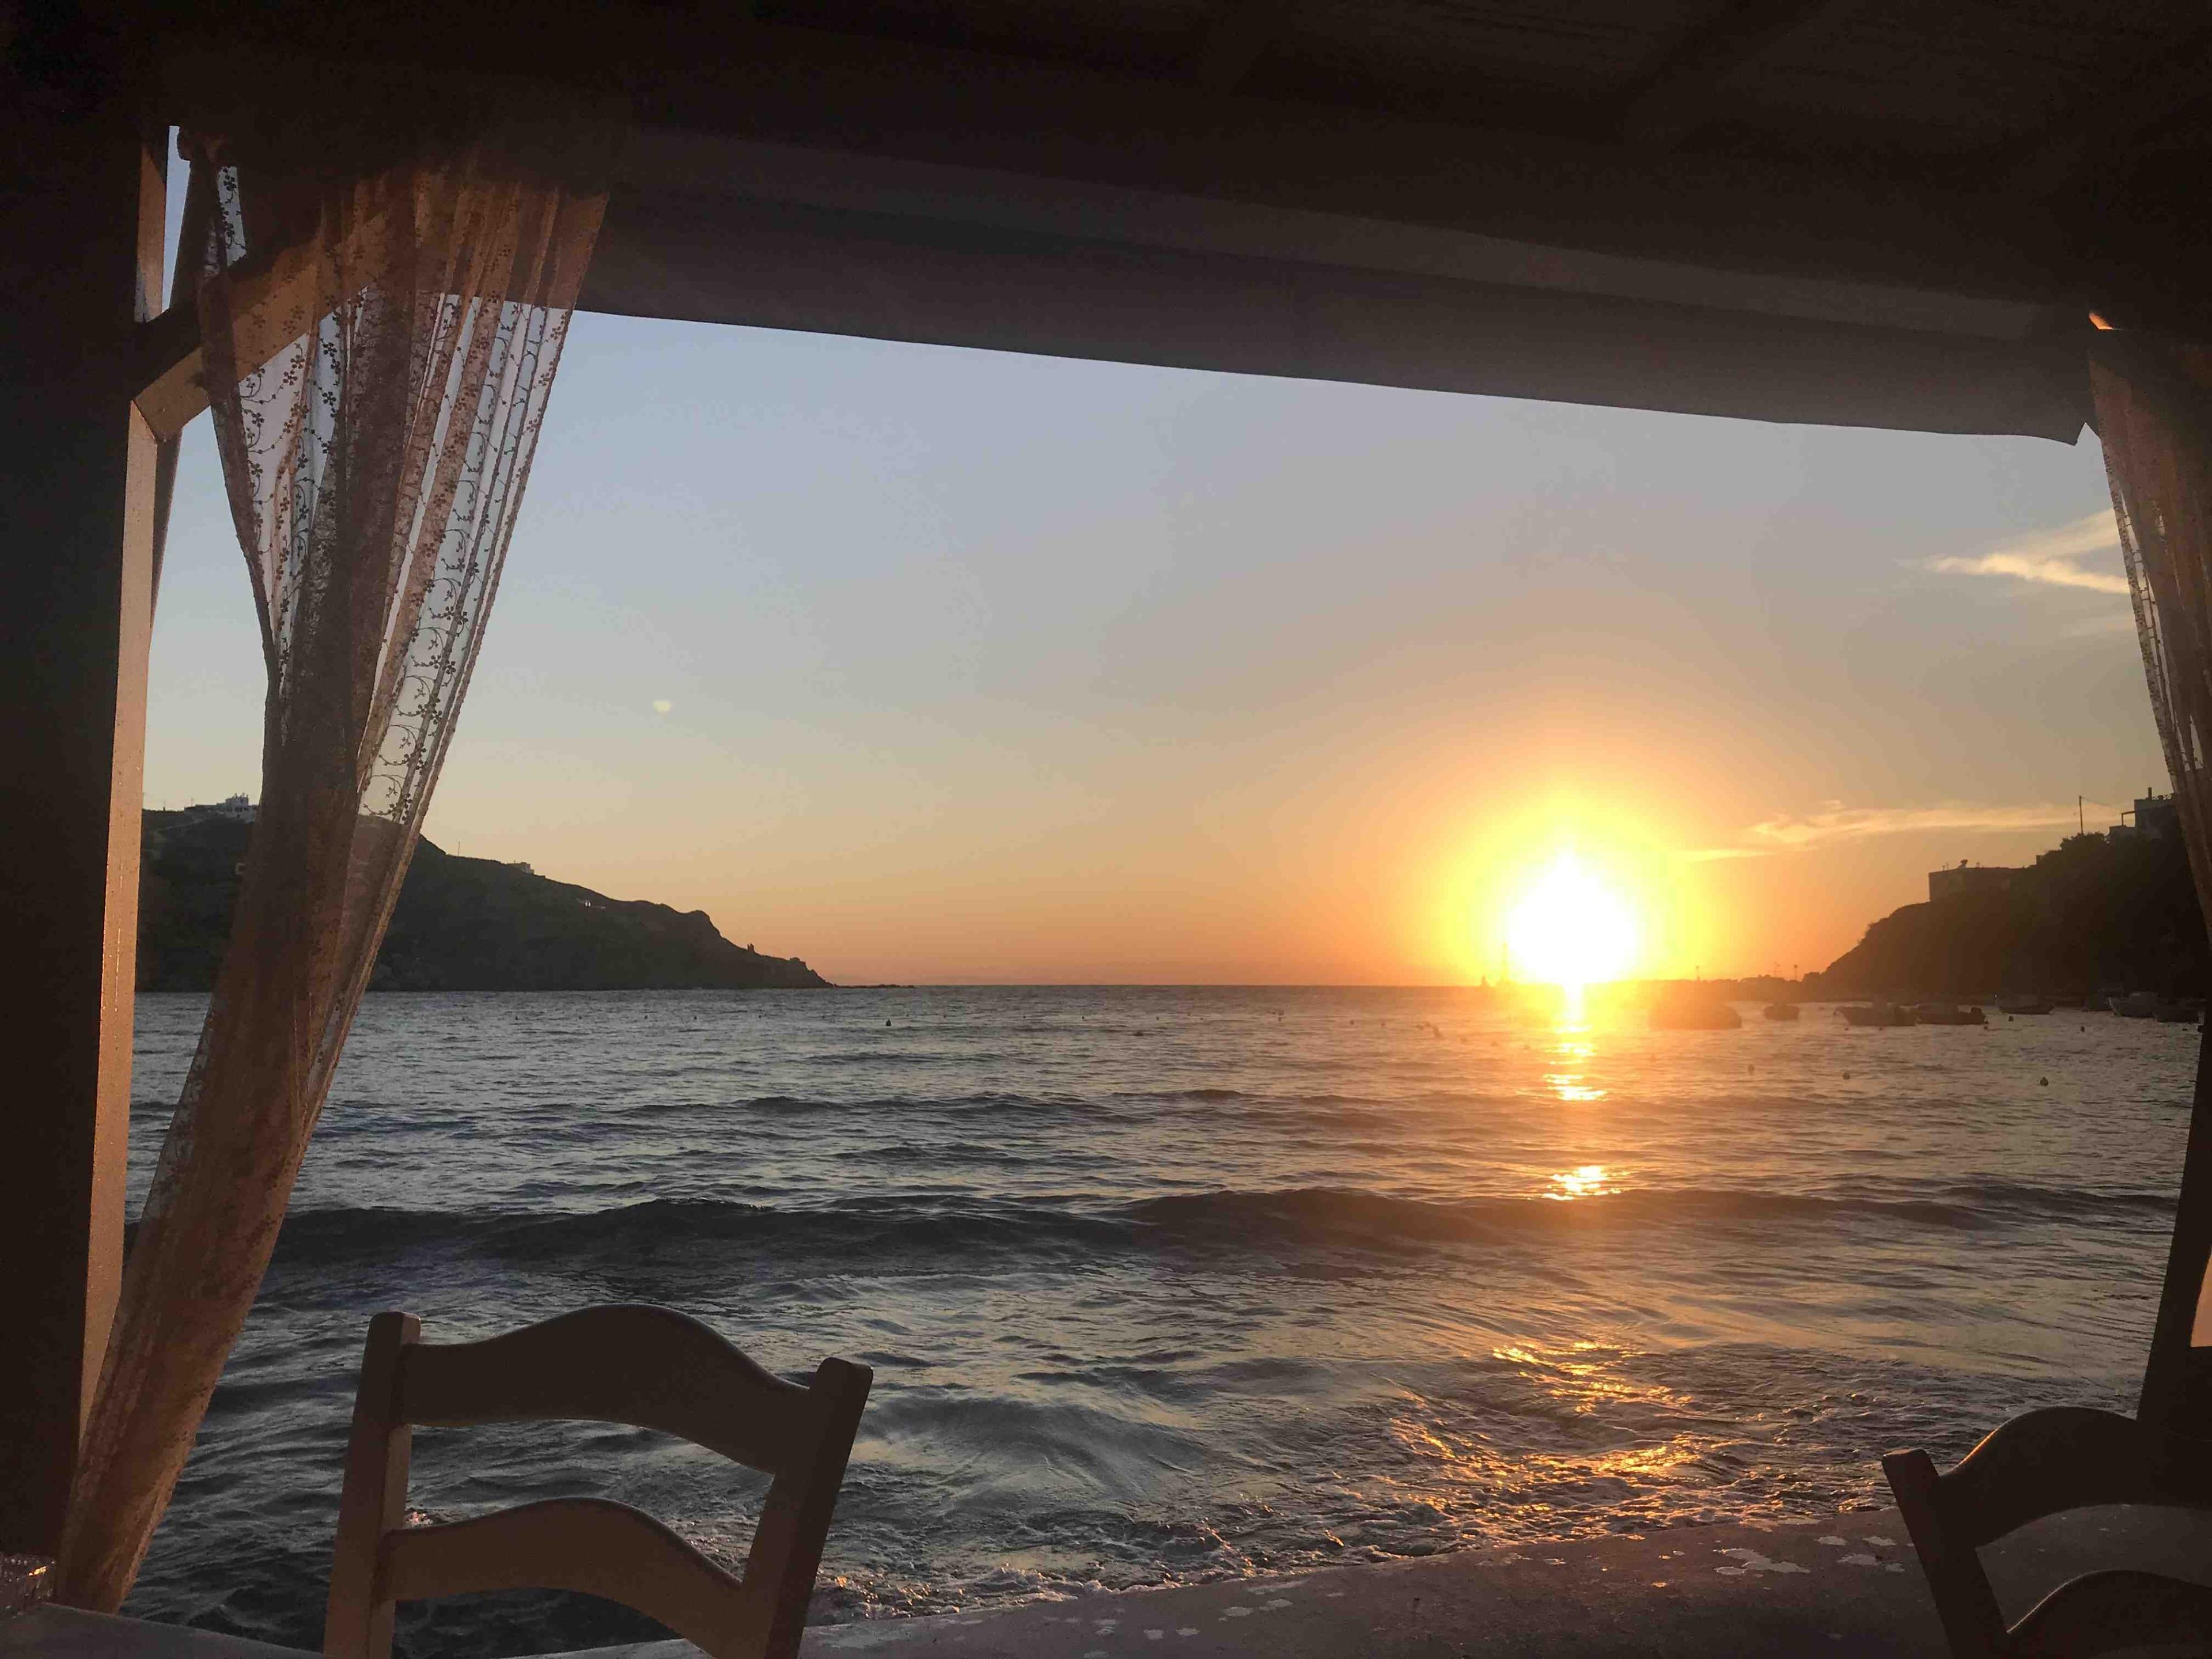 Kini, Syros, Südliche Ägäis, Griechenland